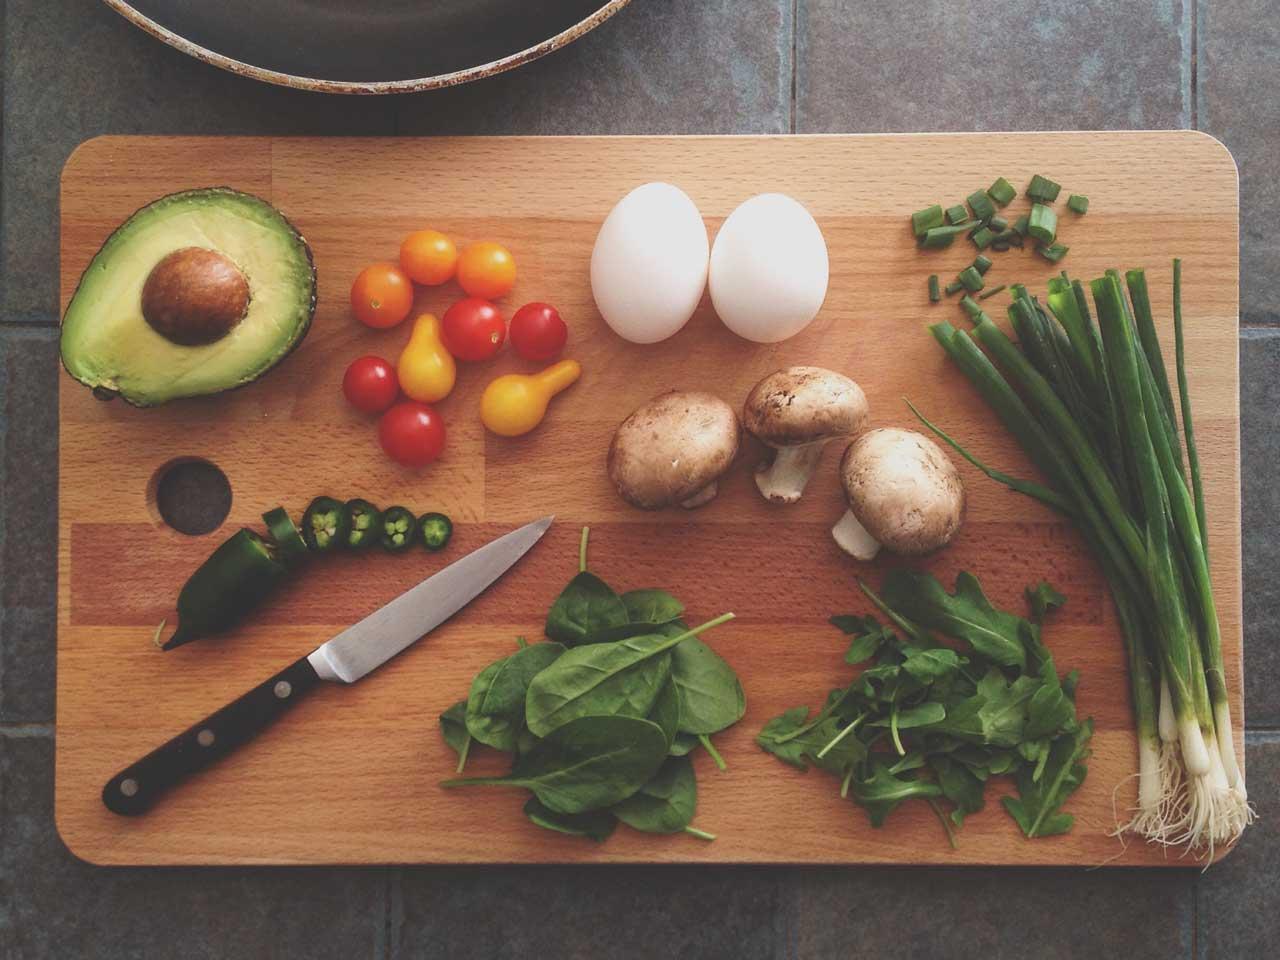 kalorienrechner-kalorienbedarf-berechnen